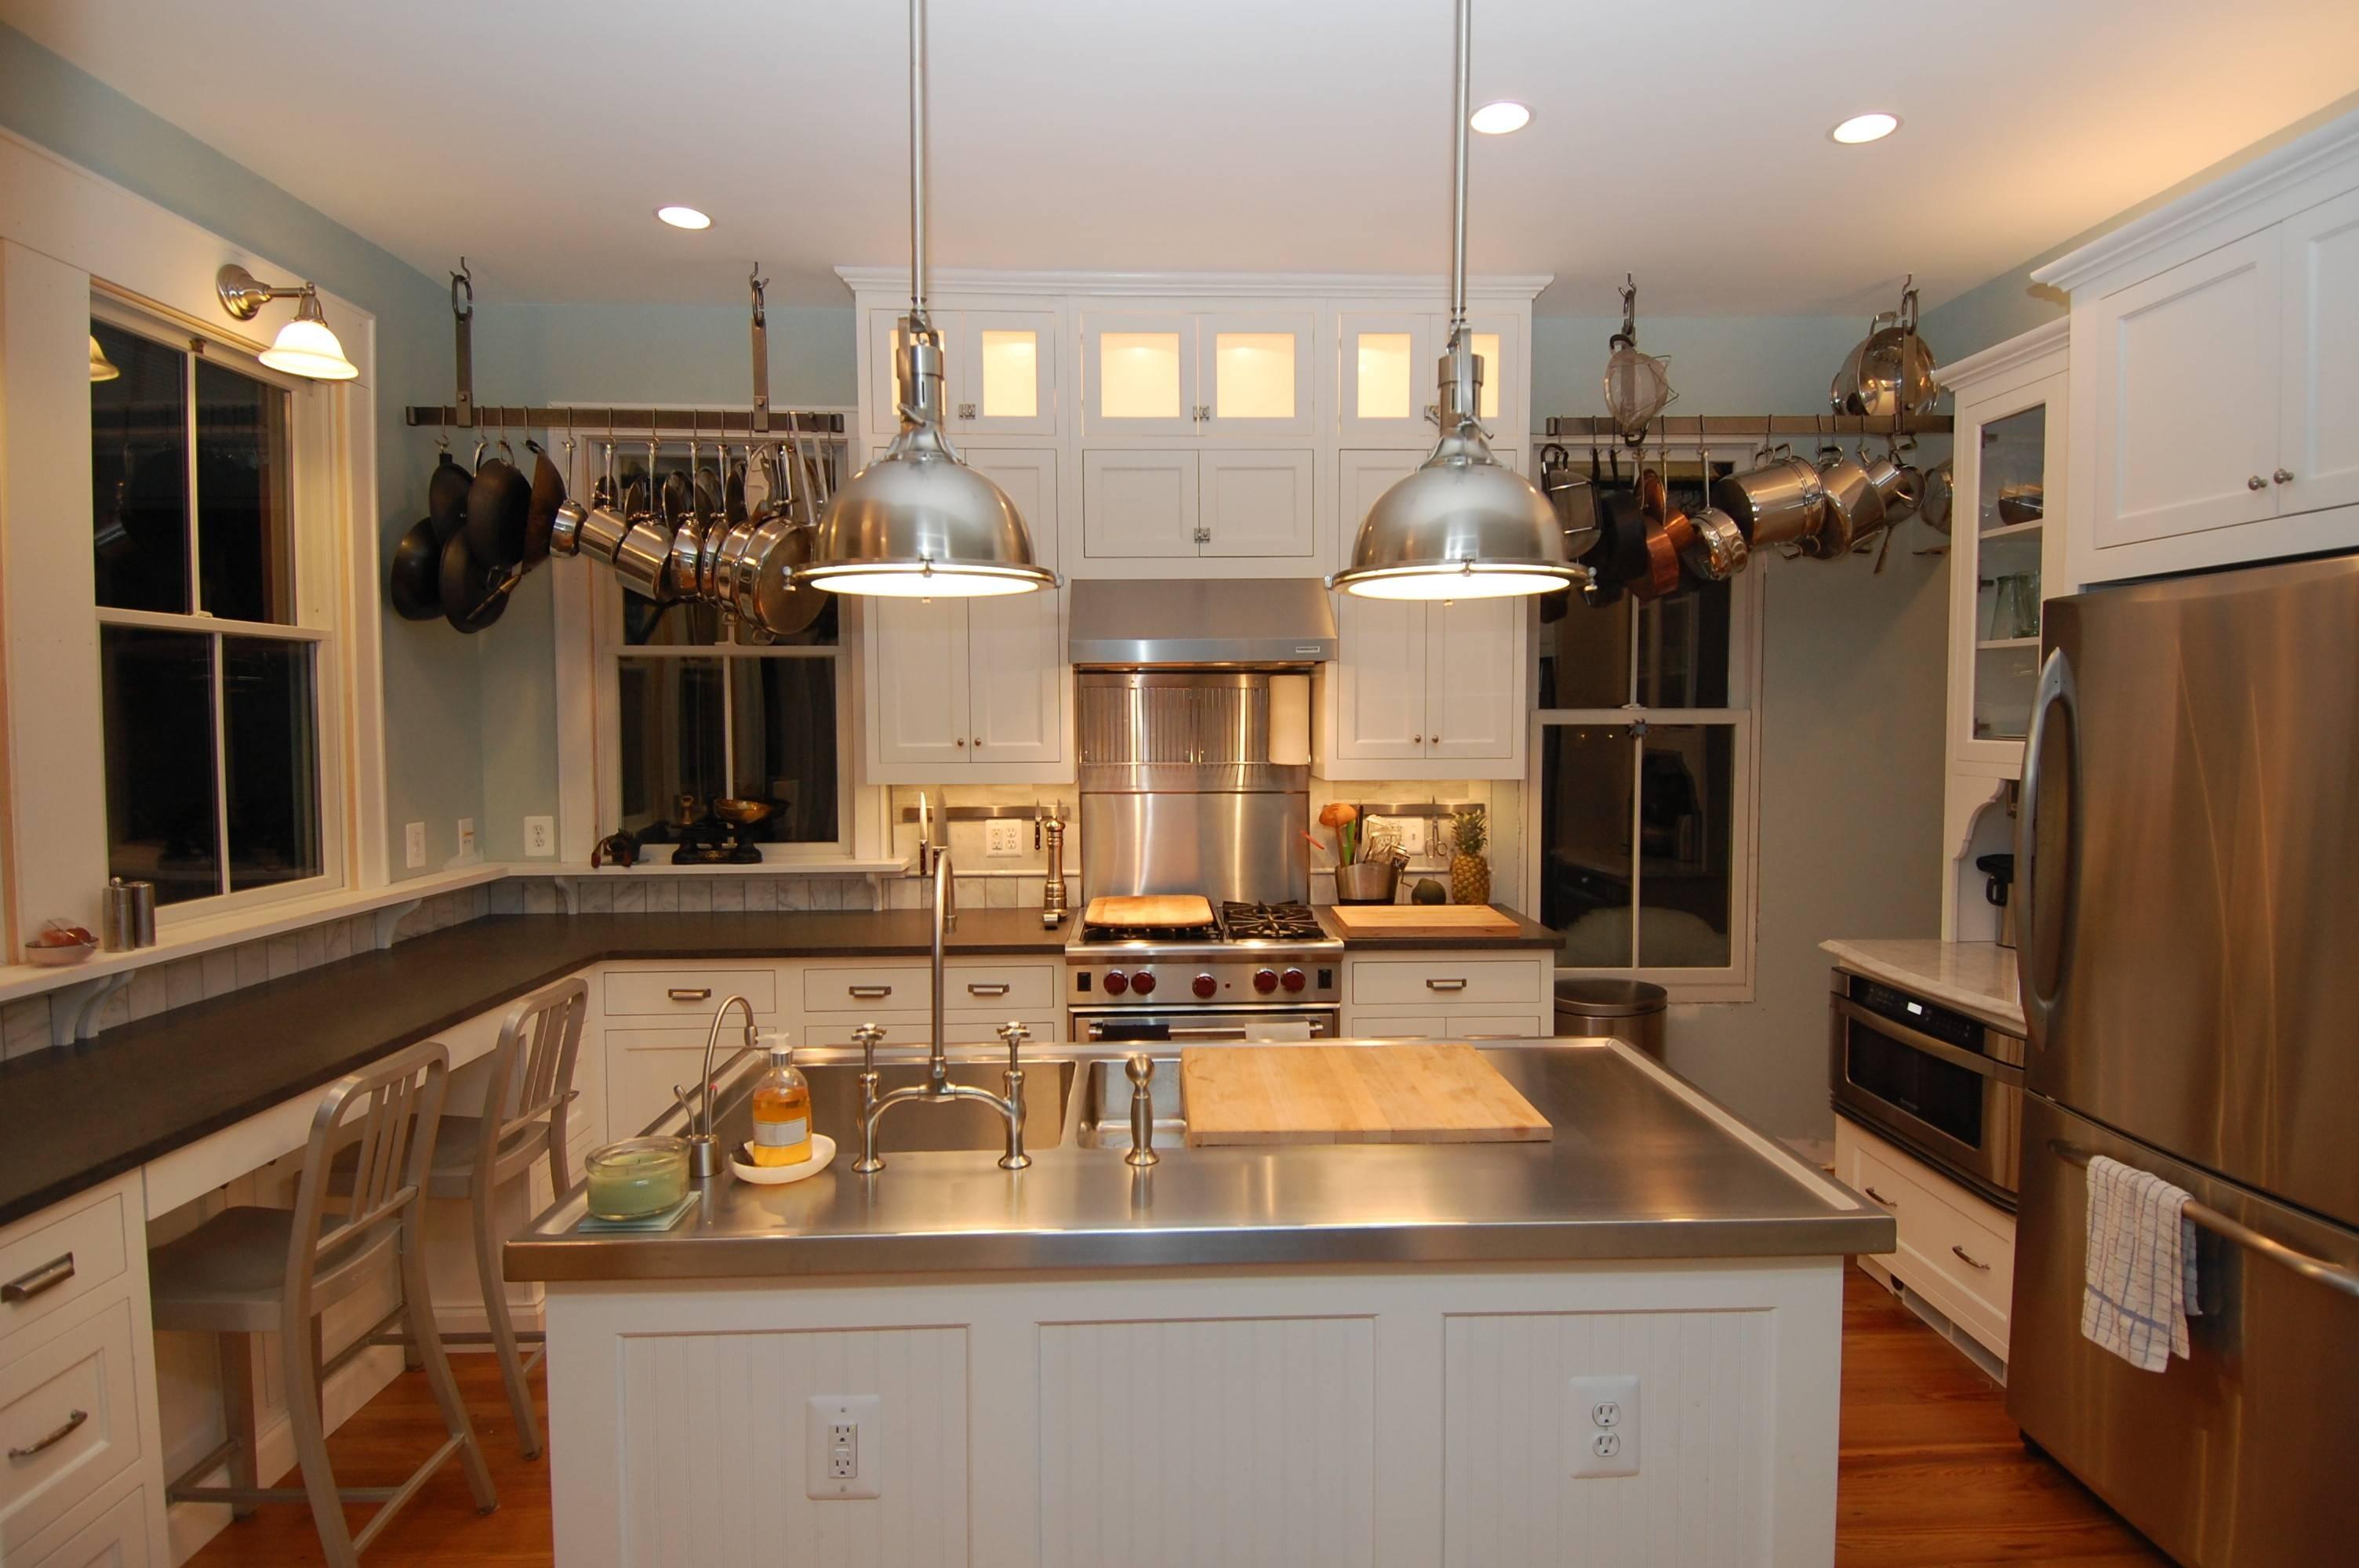 Kitchen : Stainless Steel Kitchen Countertops Original With White in Stainless Steel Kitchen Pendant Lights (Image 6 of 15)